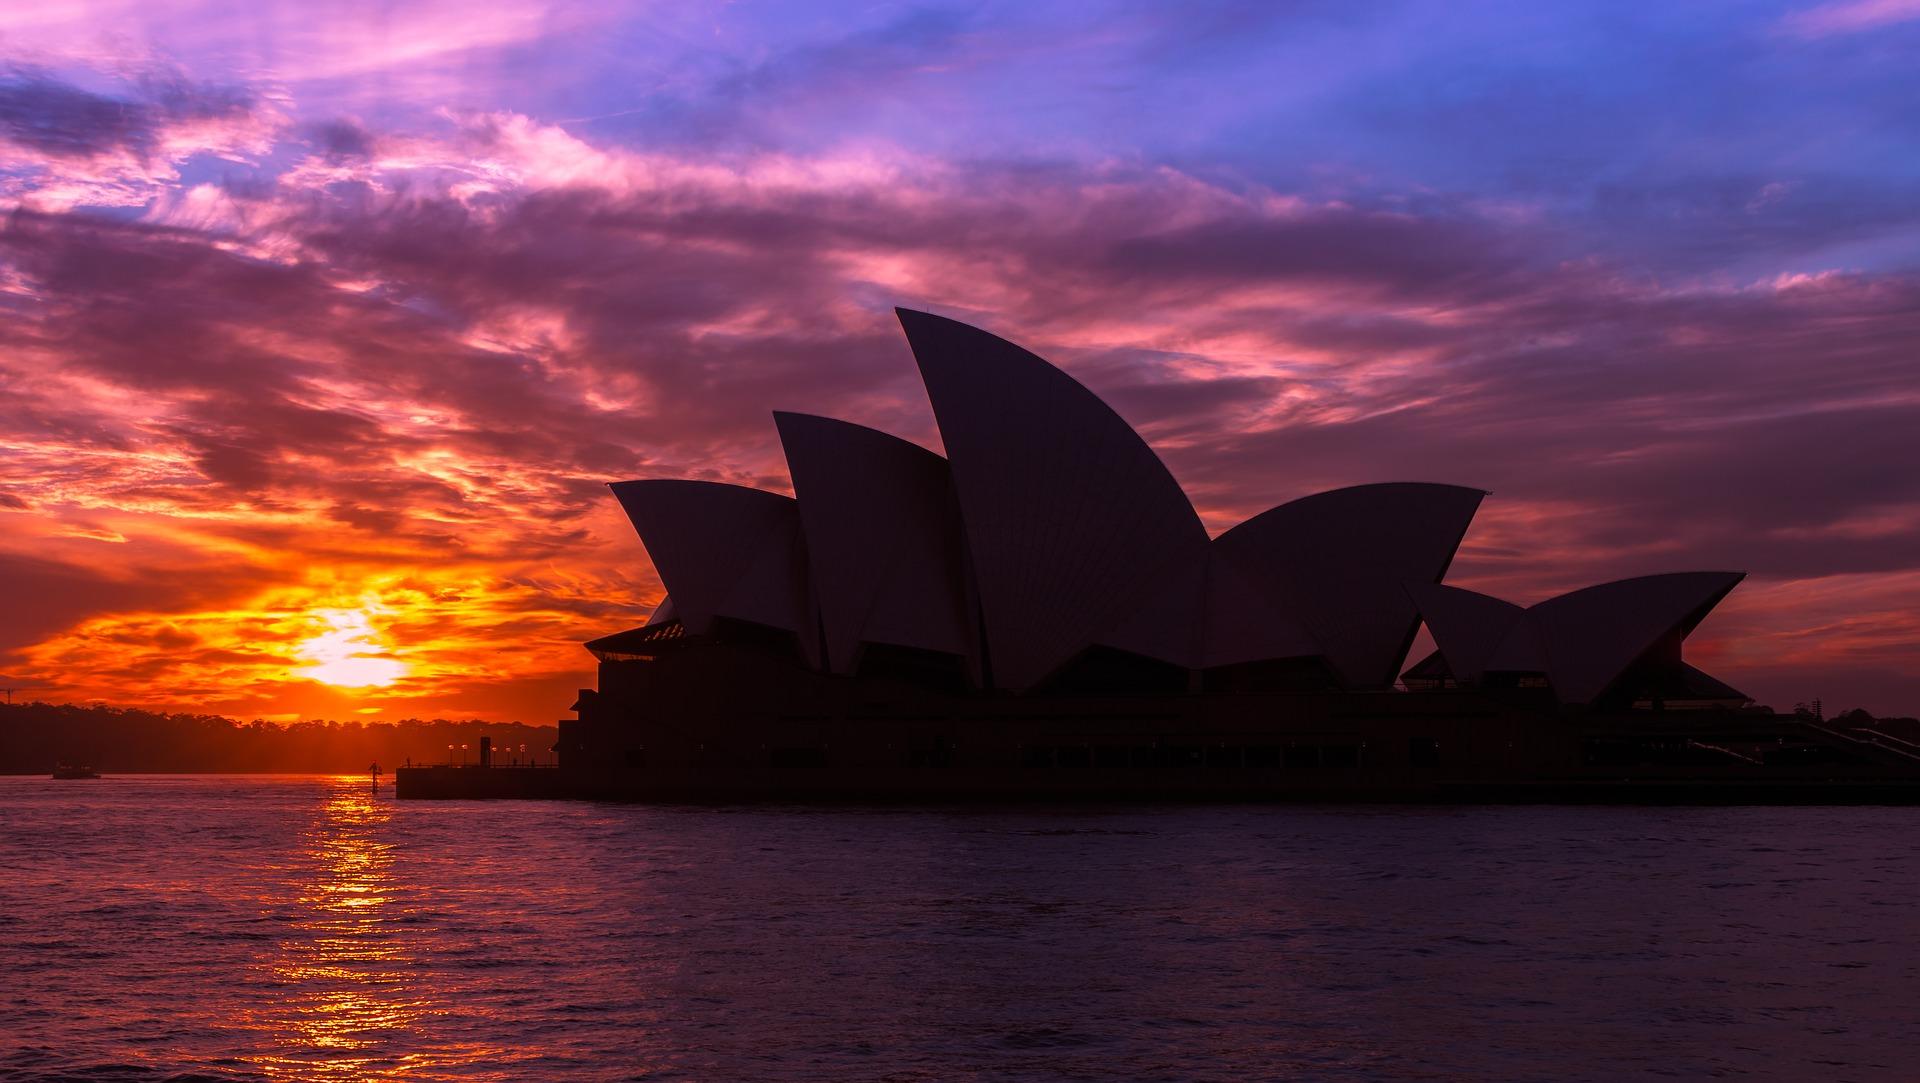 sydney_opera_house_sunset.jpg